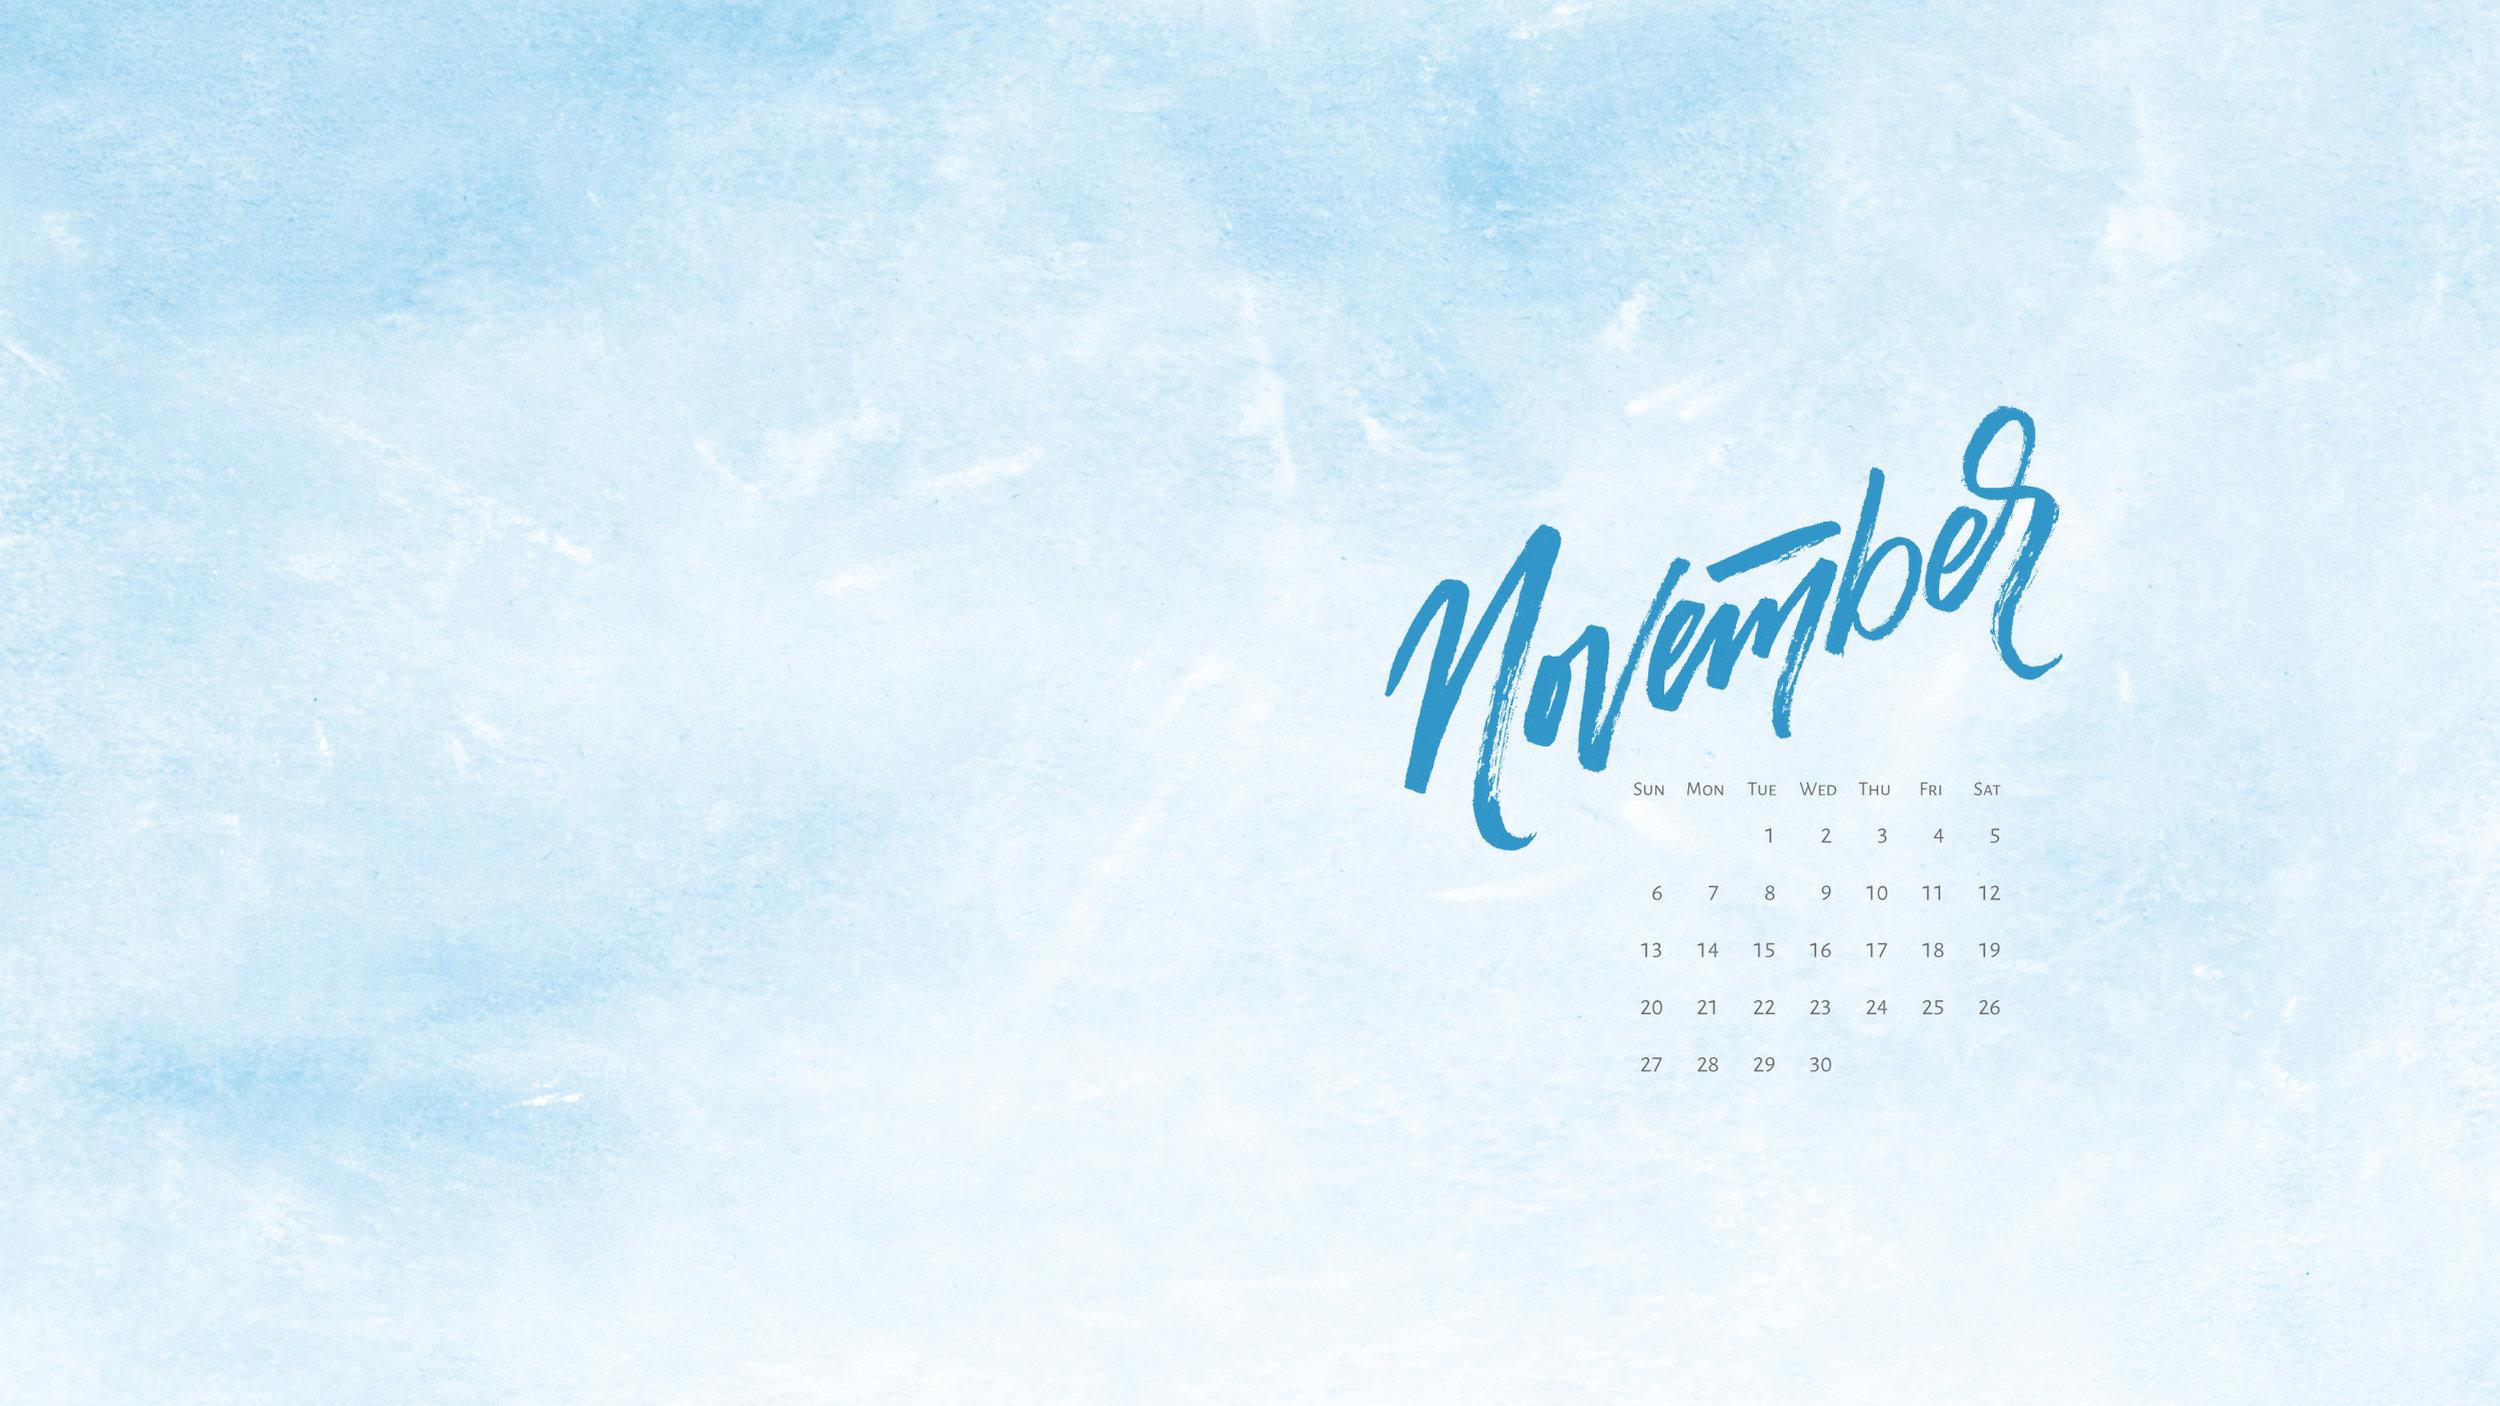 Free desktop calendar for November 2016. For personal use only  |  ©  t  ypeandgraphicslab.com